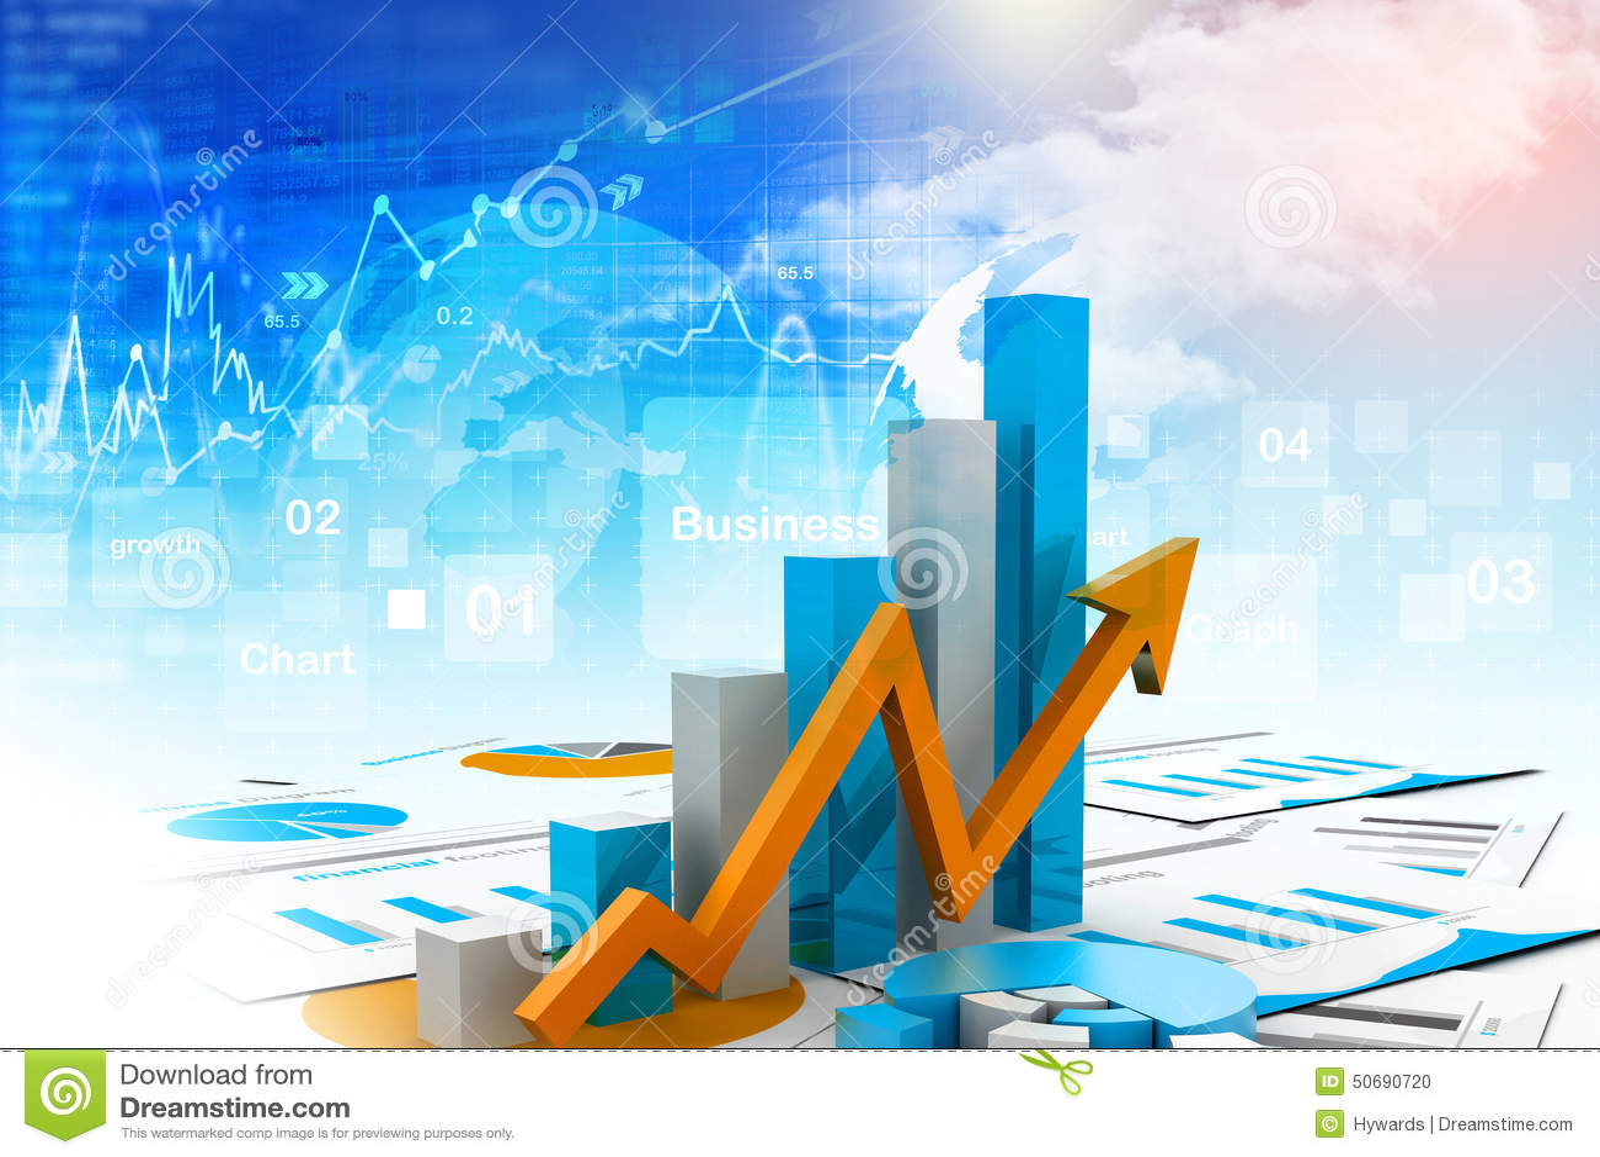 Download 经济图和图表 库存例证. 插画 包括有 辅助, 竞争, 预测, 例证, 远期, 商业, 经济, 抽象, 事故 - 50690720